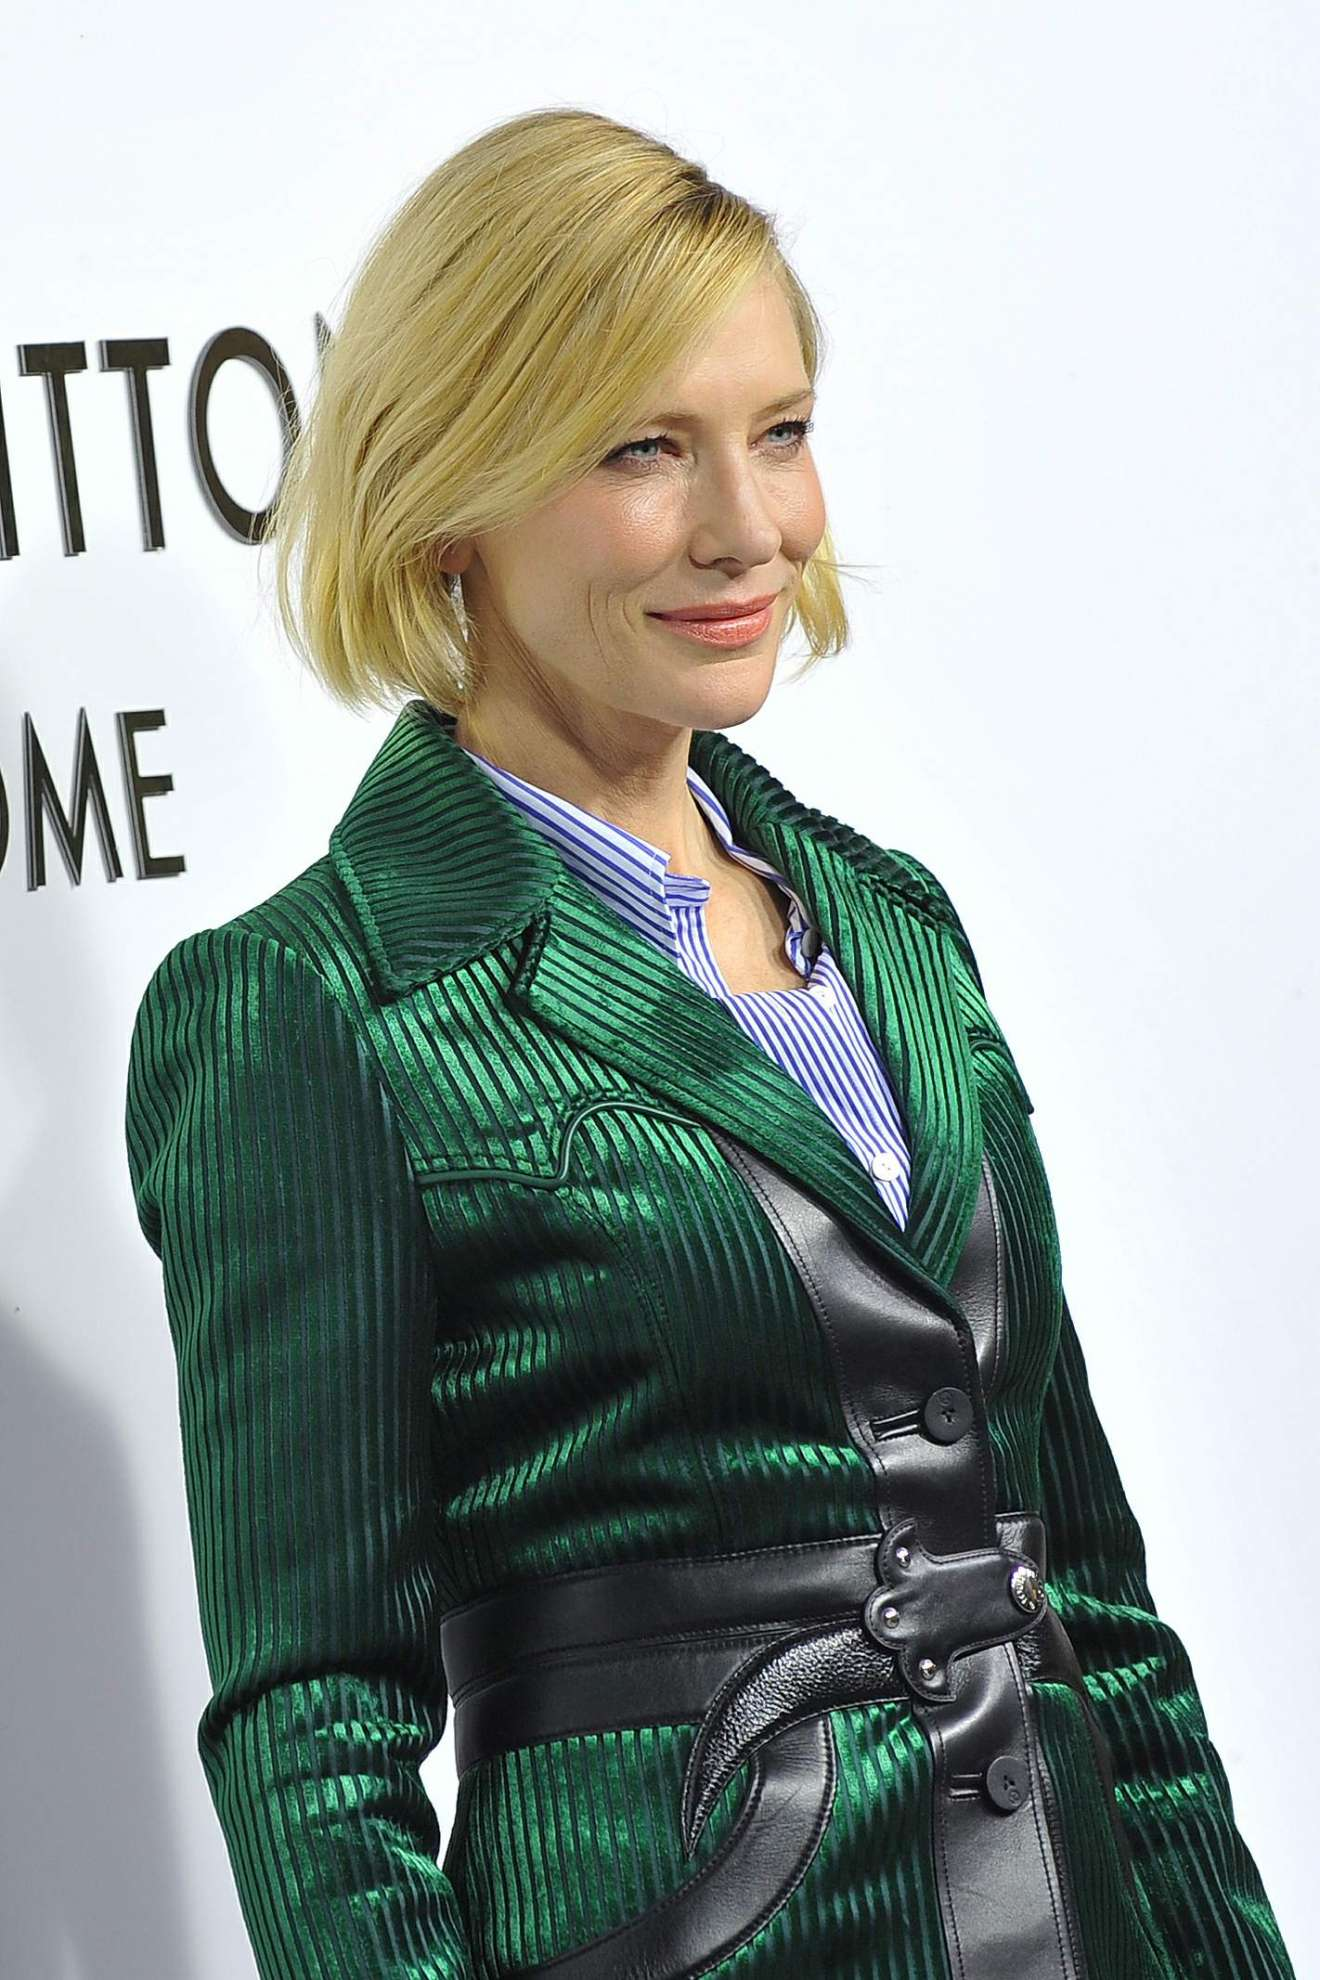 Cate Blanchett - Louis Vuitton Boutique Opening - Spring Summer 2018 - Paris FW